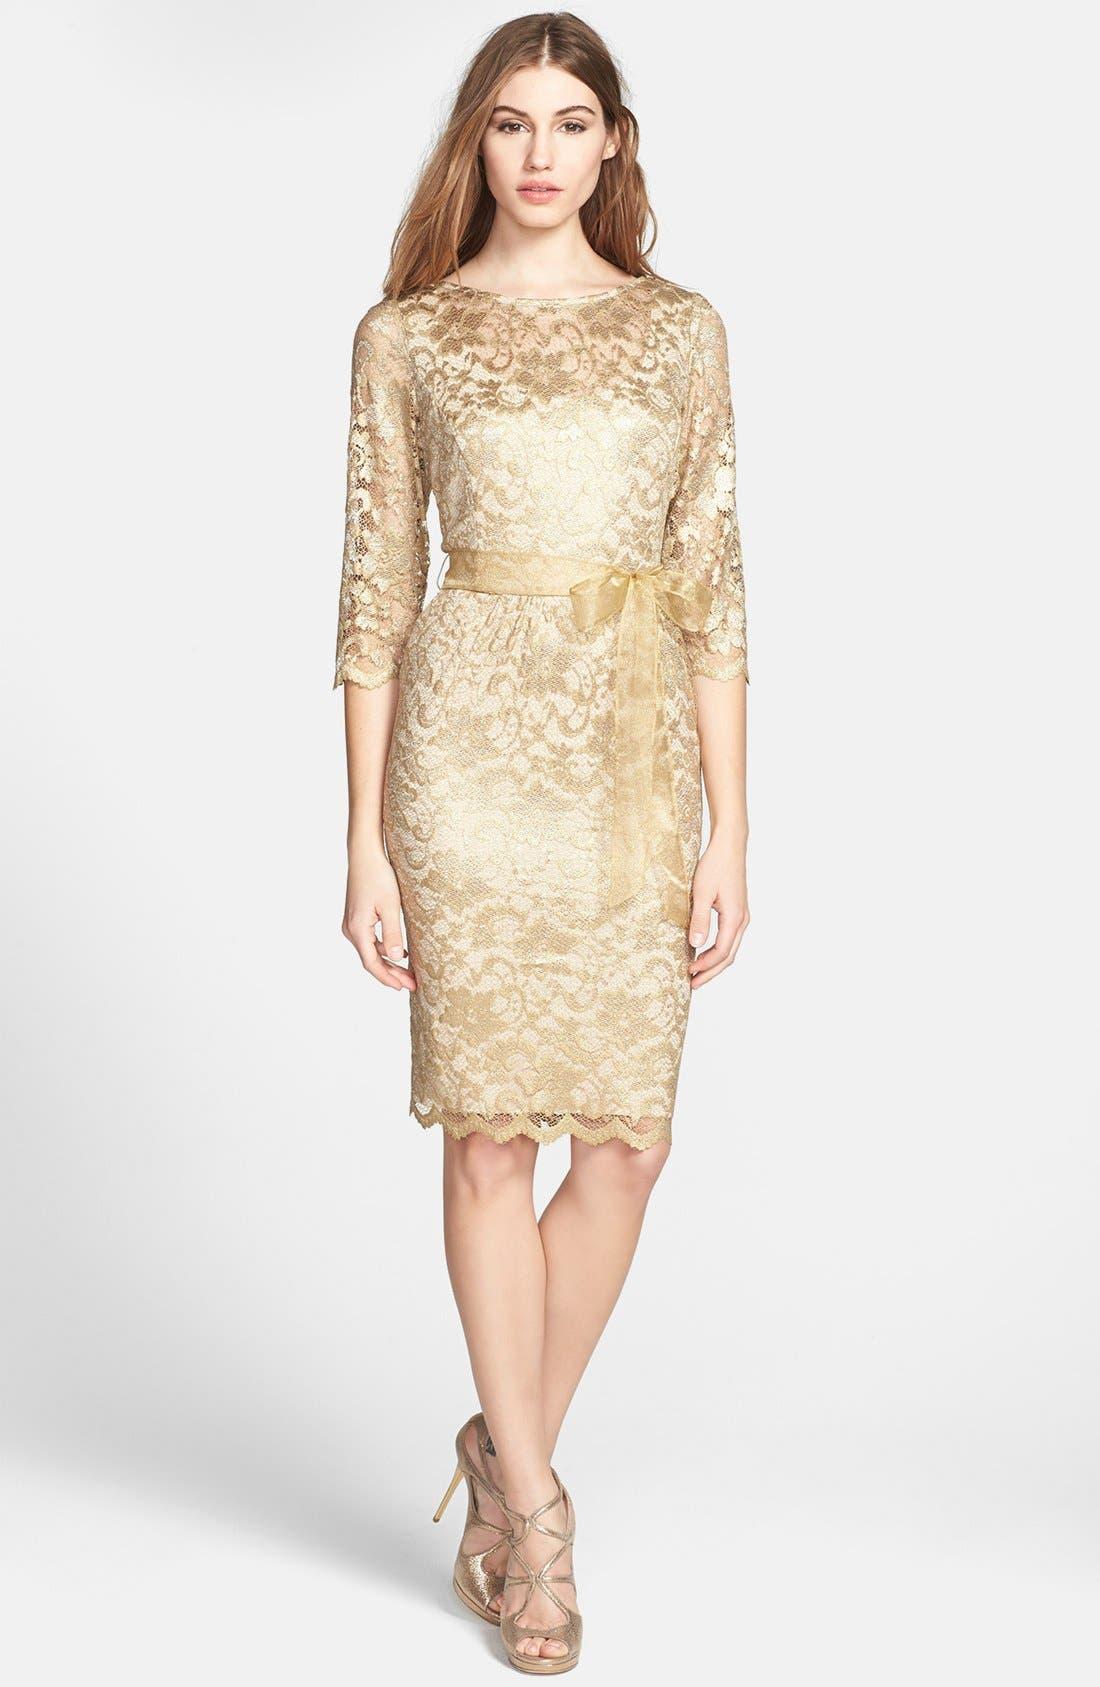 Alternate Image 1 Selected - Alex Evenings Illusion Sleeve Lace Dress (Petite)